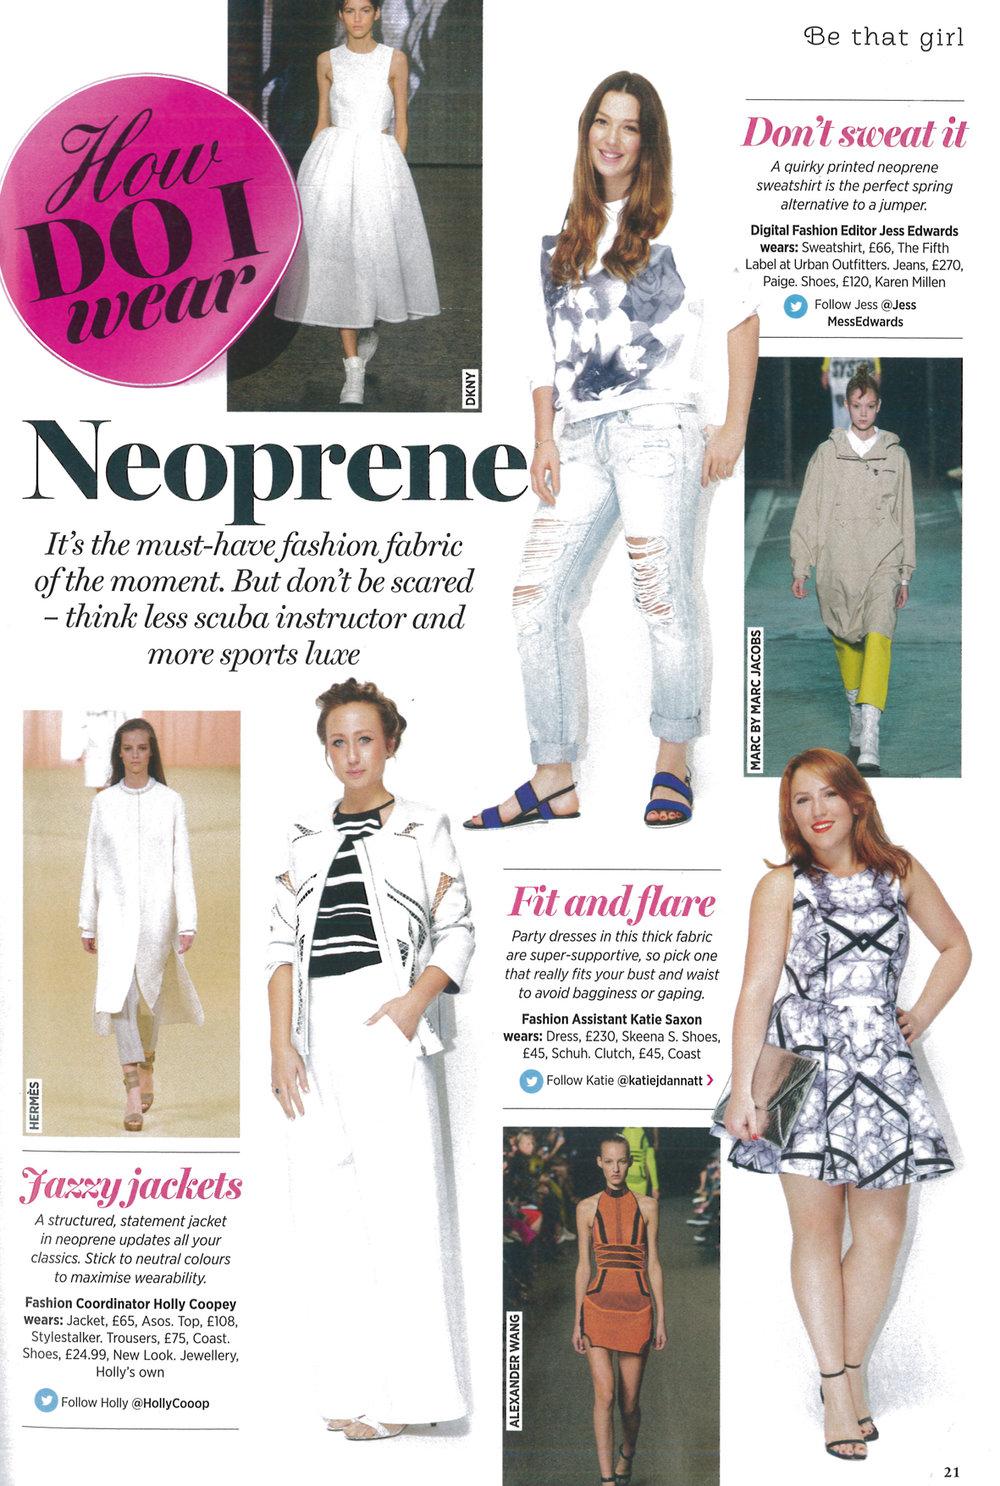 SKE Cosmopolitan 03.03.15.jpg